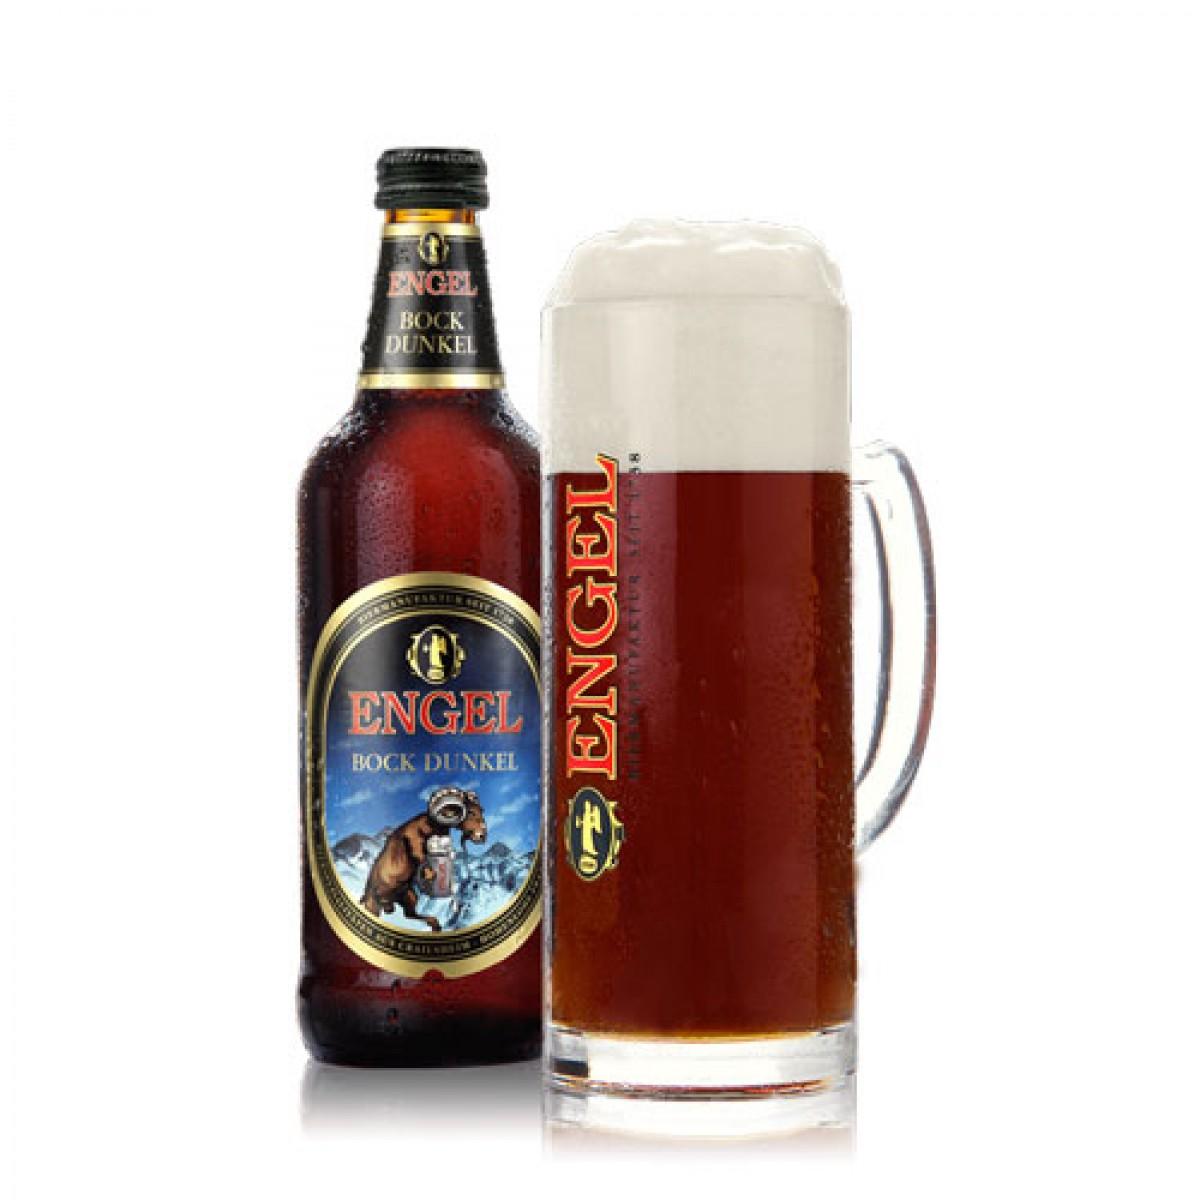 Bia Engel Bock Dunkel 7,2% Đức-chai 500 ml